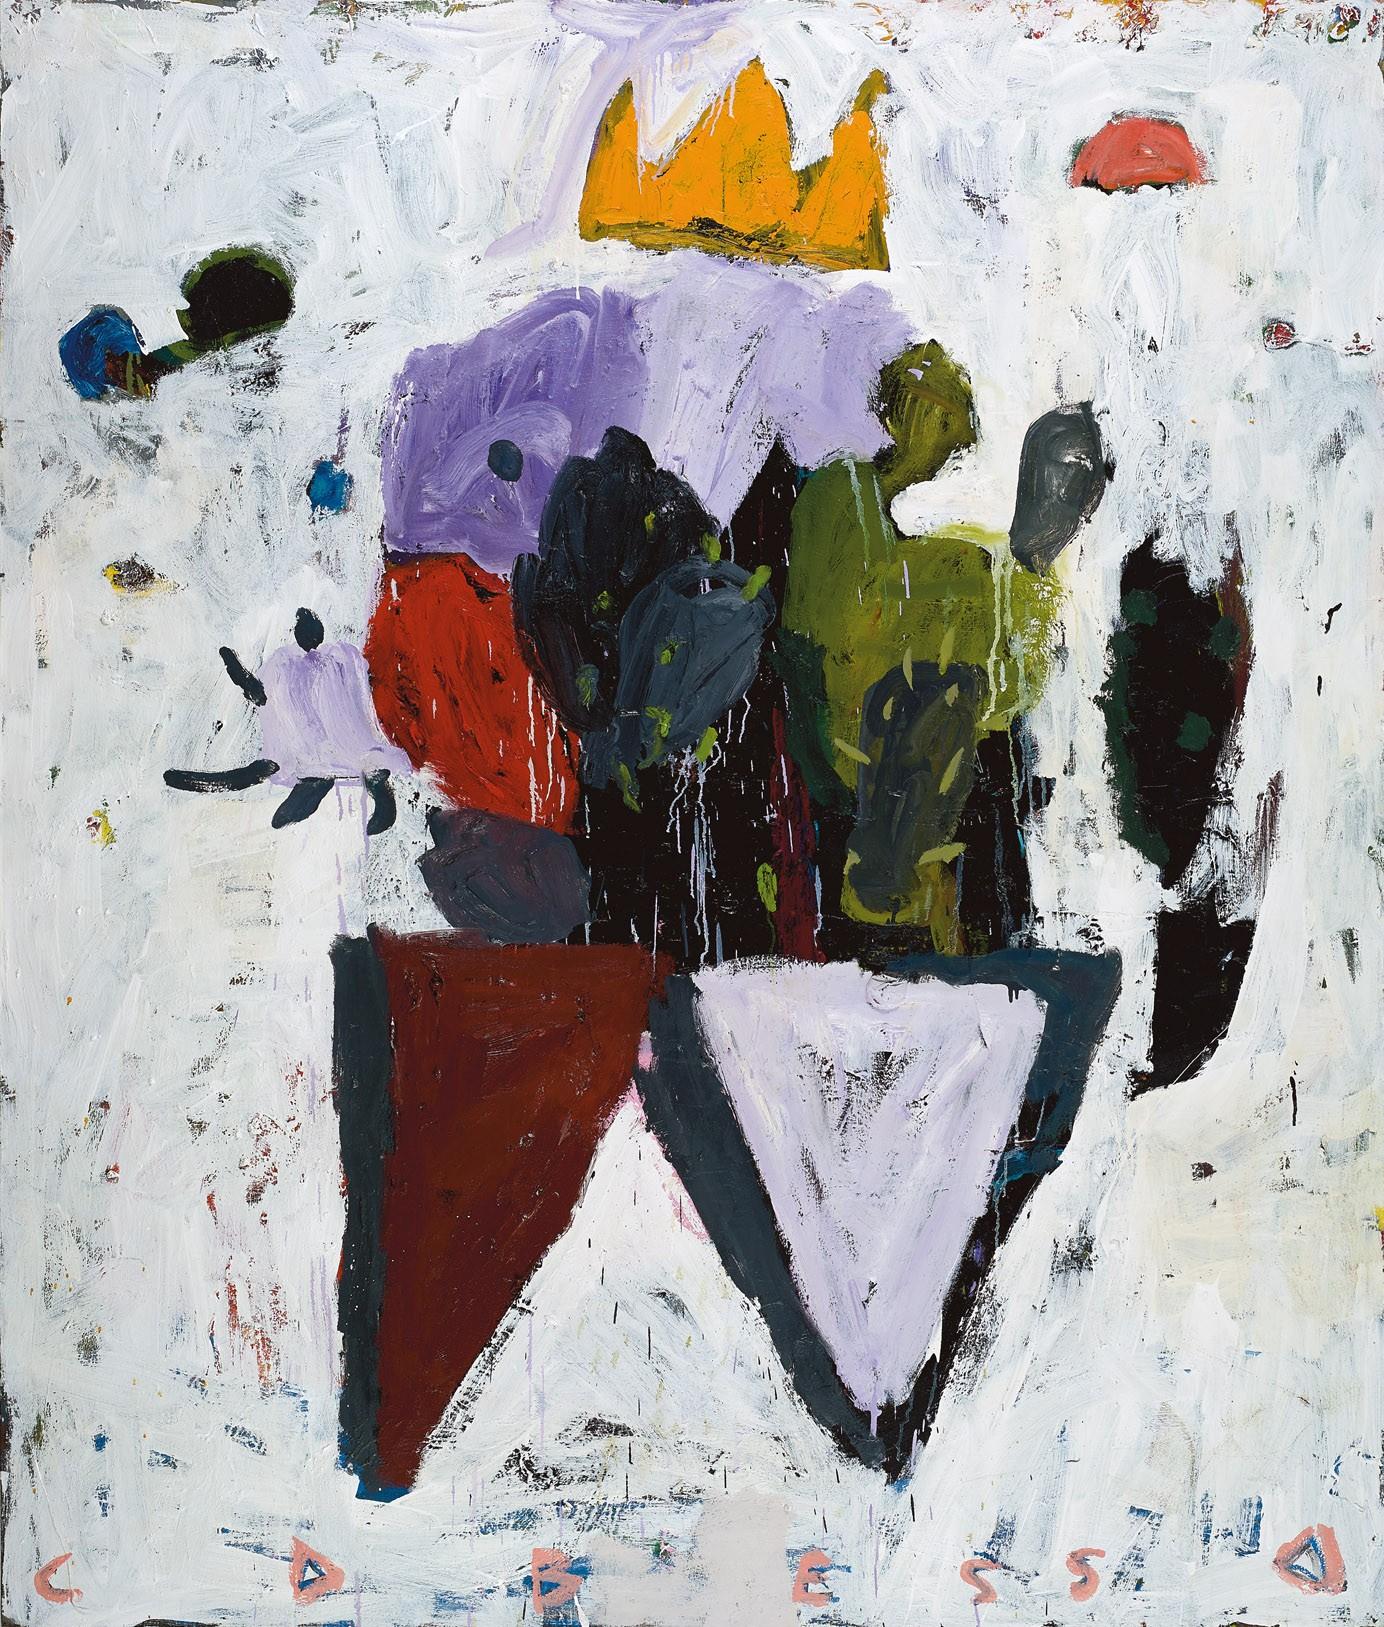 Amit Cabessa, 2018, Oil on canvas 200 x 170 cm